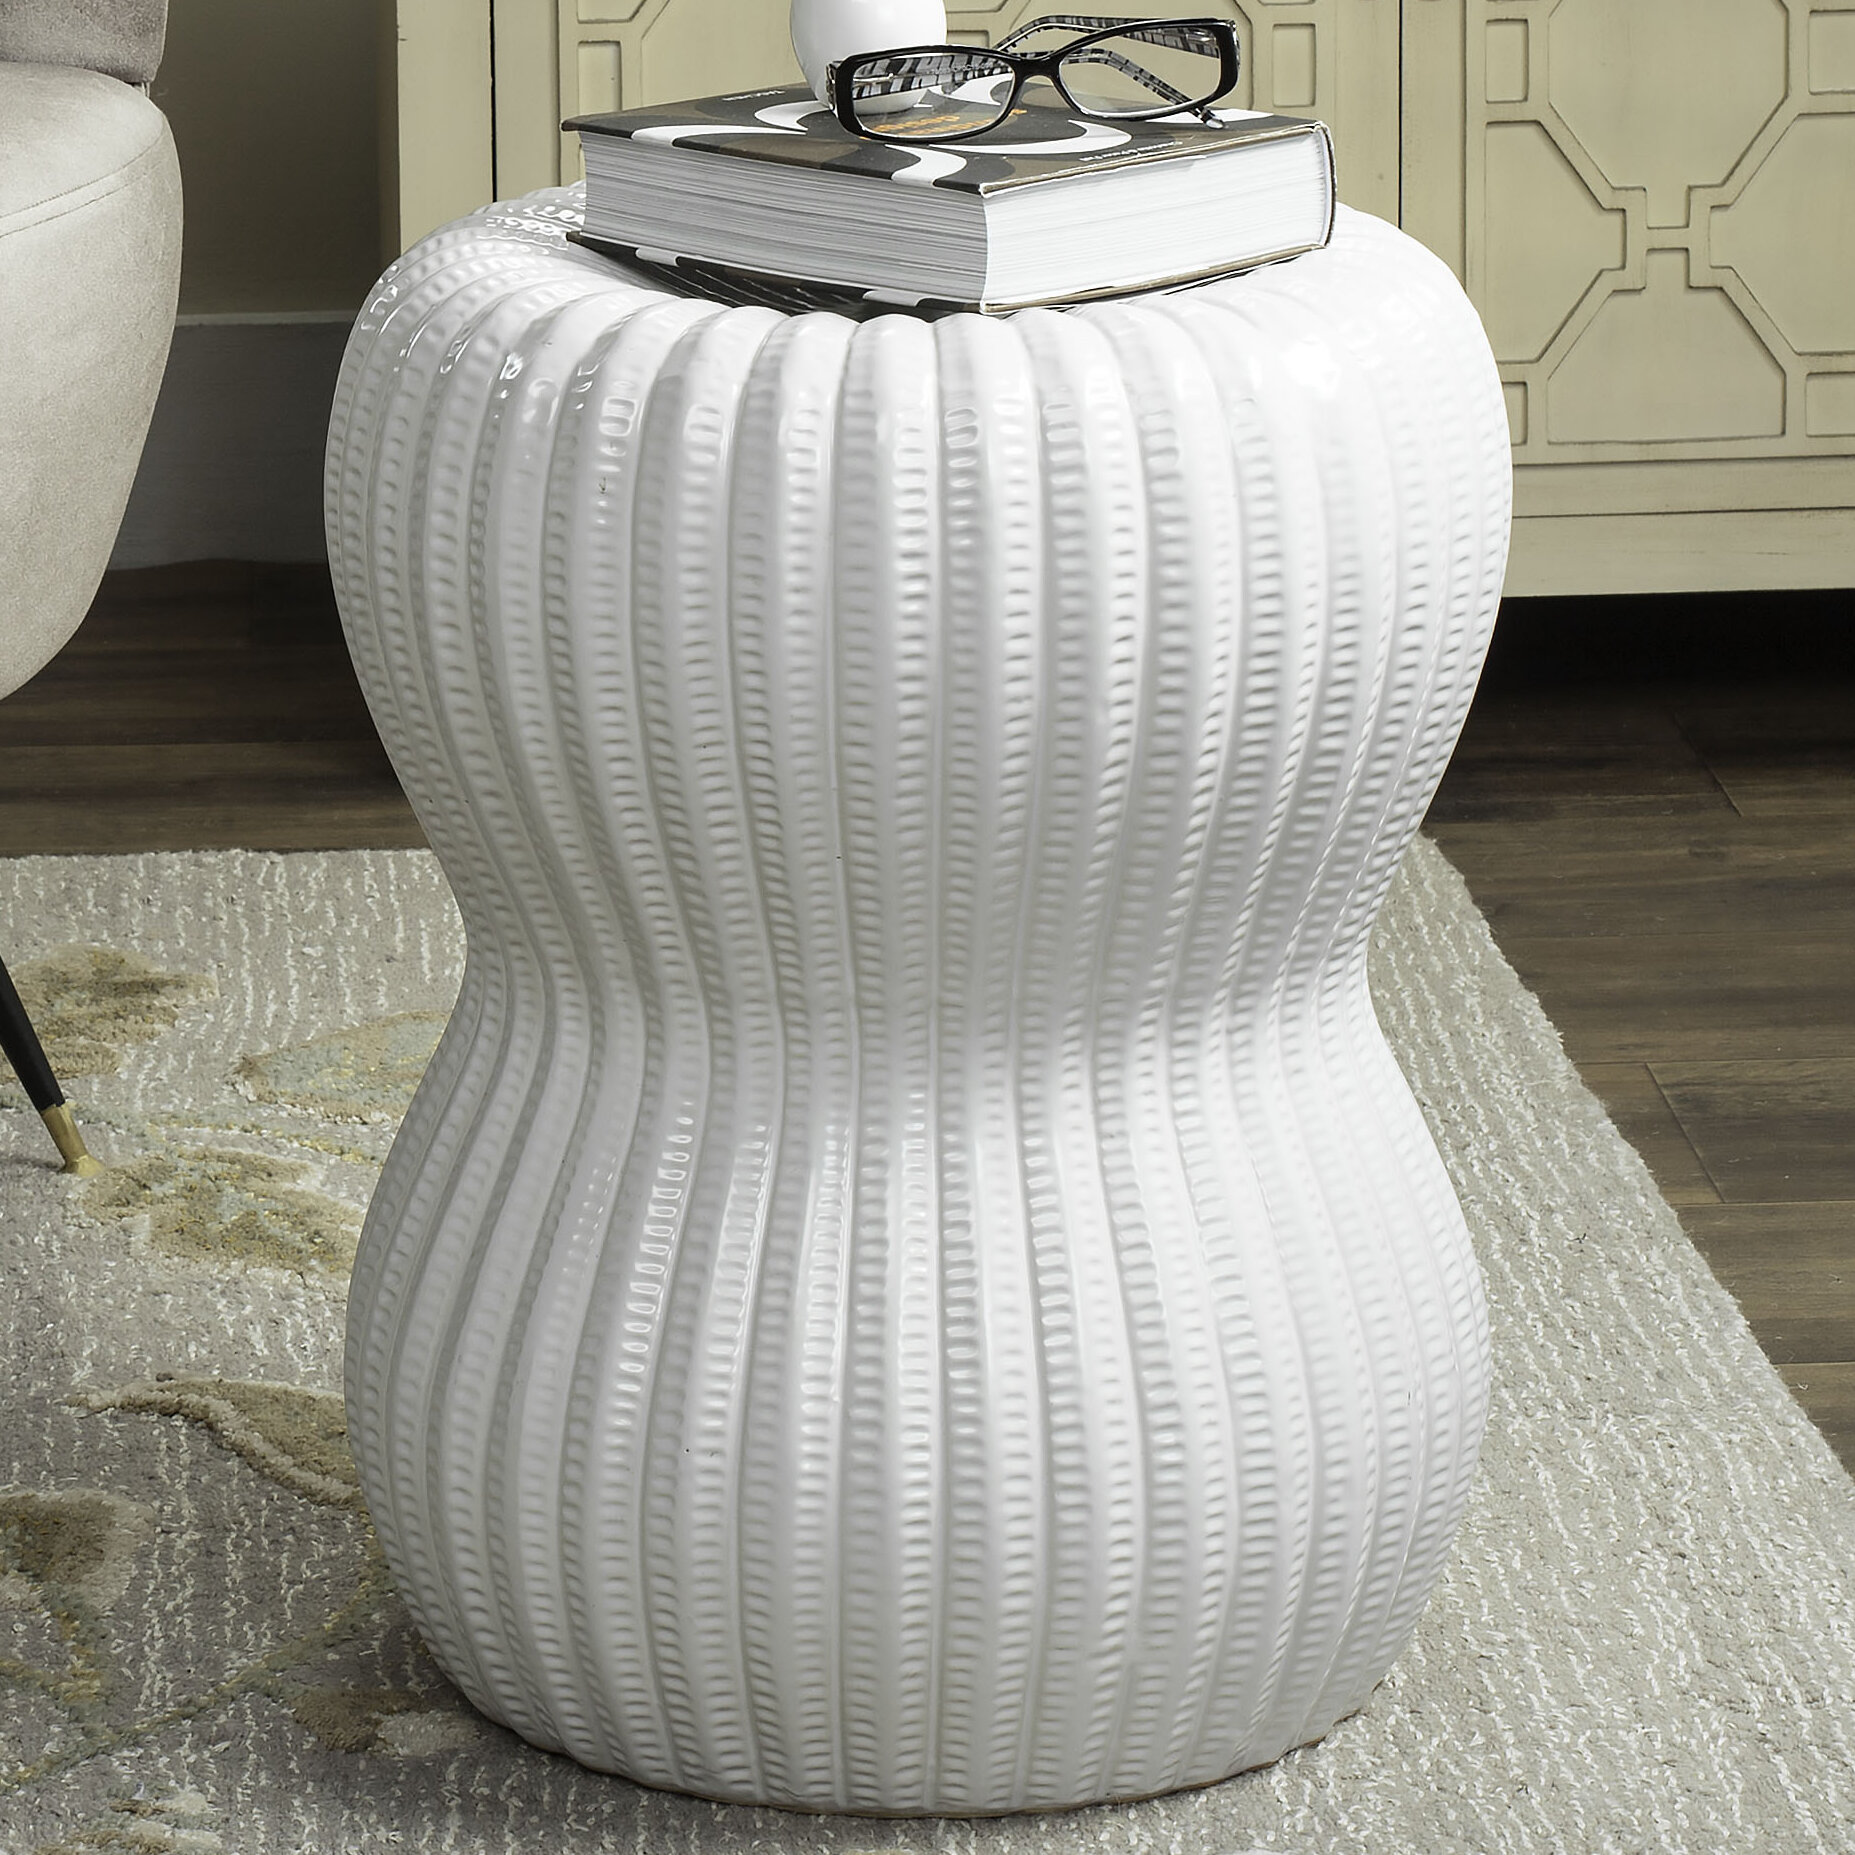 Incredible Safavieh Garden Stool Reviews Wayfair Machost Co Dining Chair Design Ideas Machostcouk